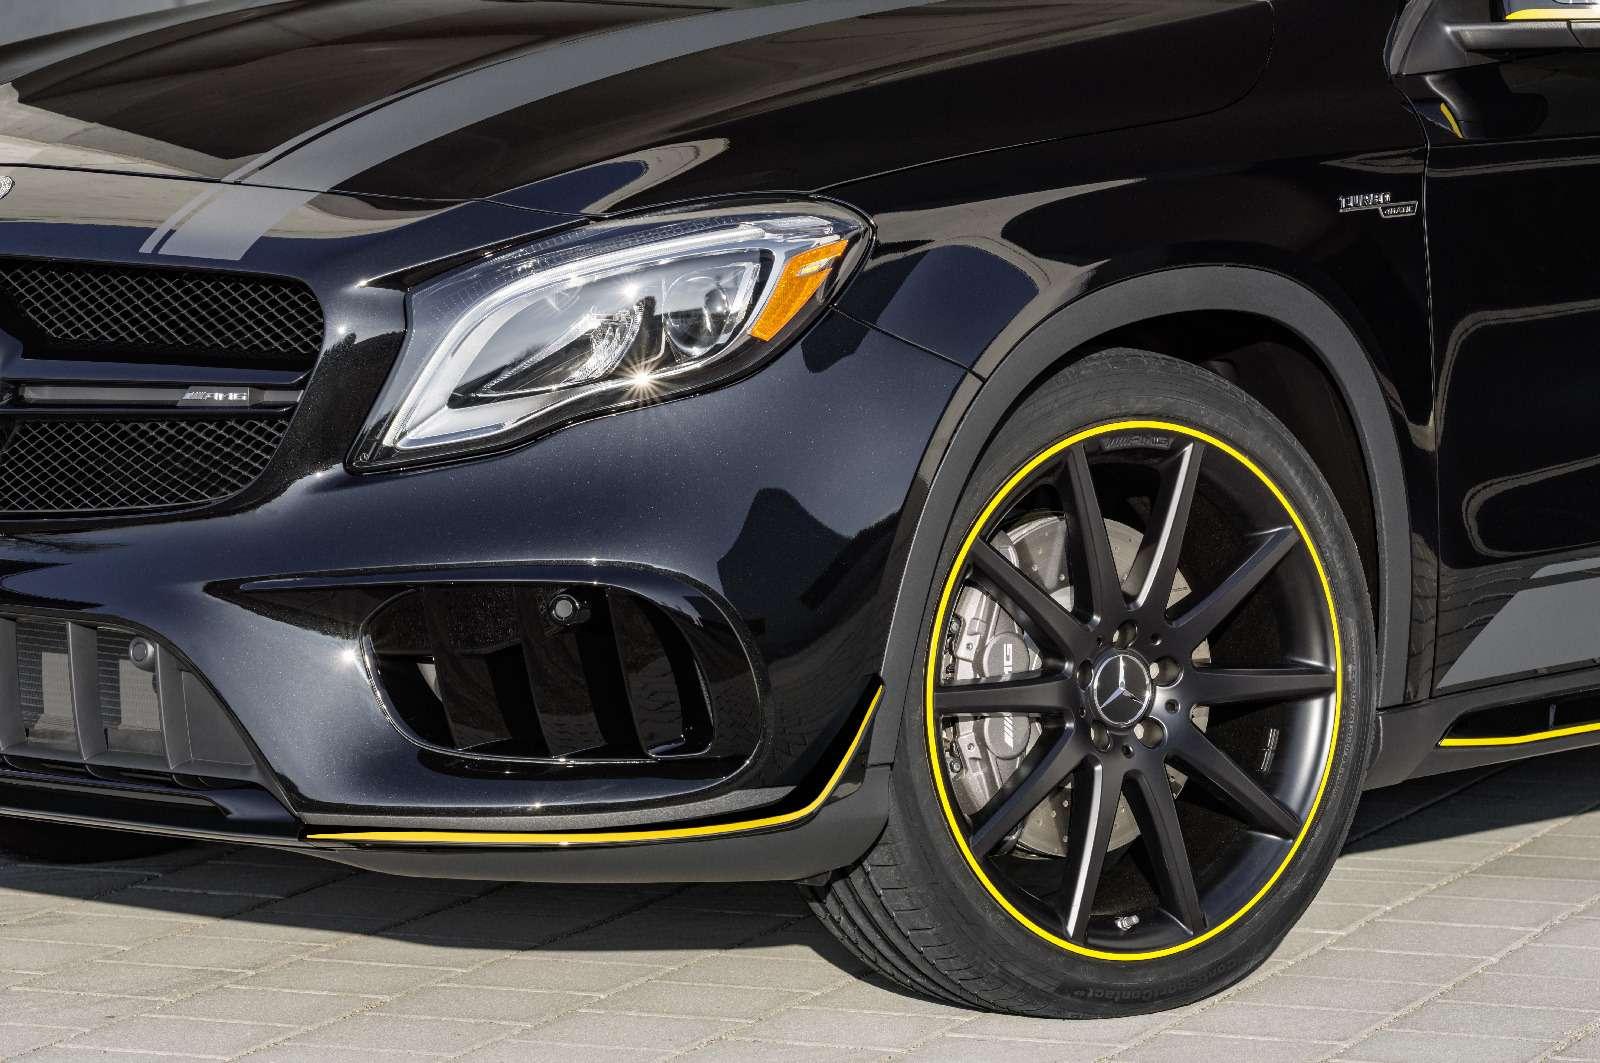 Mercedes-Benz GLA стал краше, нонепросторнее— фото 690082